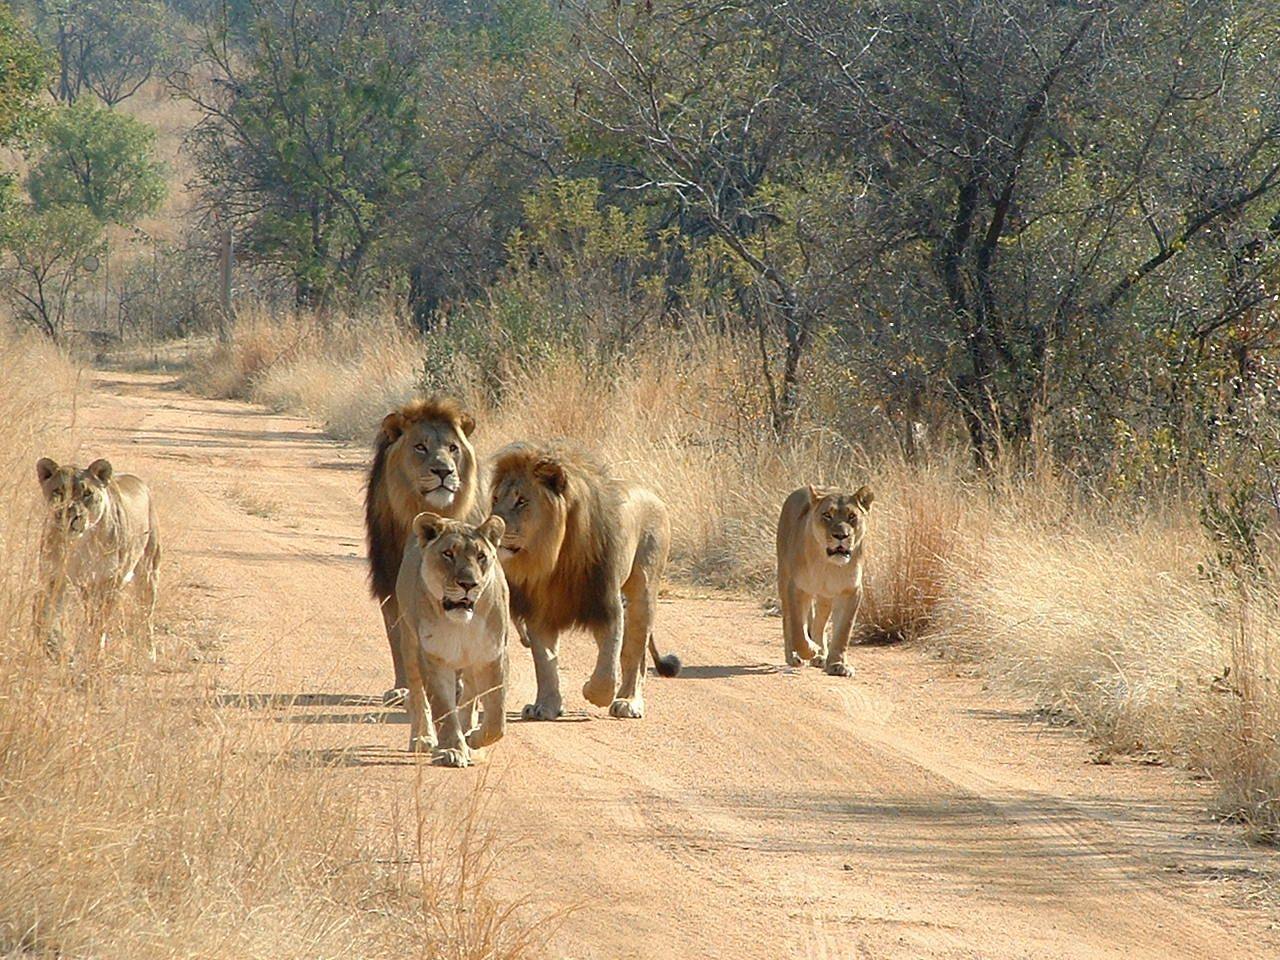 Afrika Safari Lowen Im Afrika Reisefuhrer Http Www Abenteurer